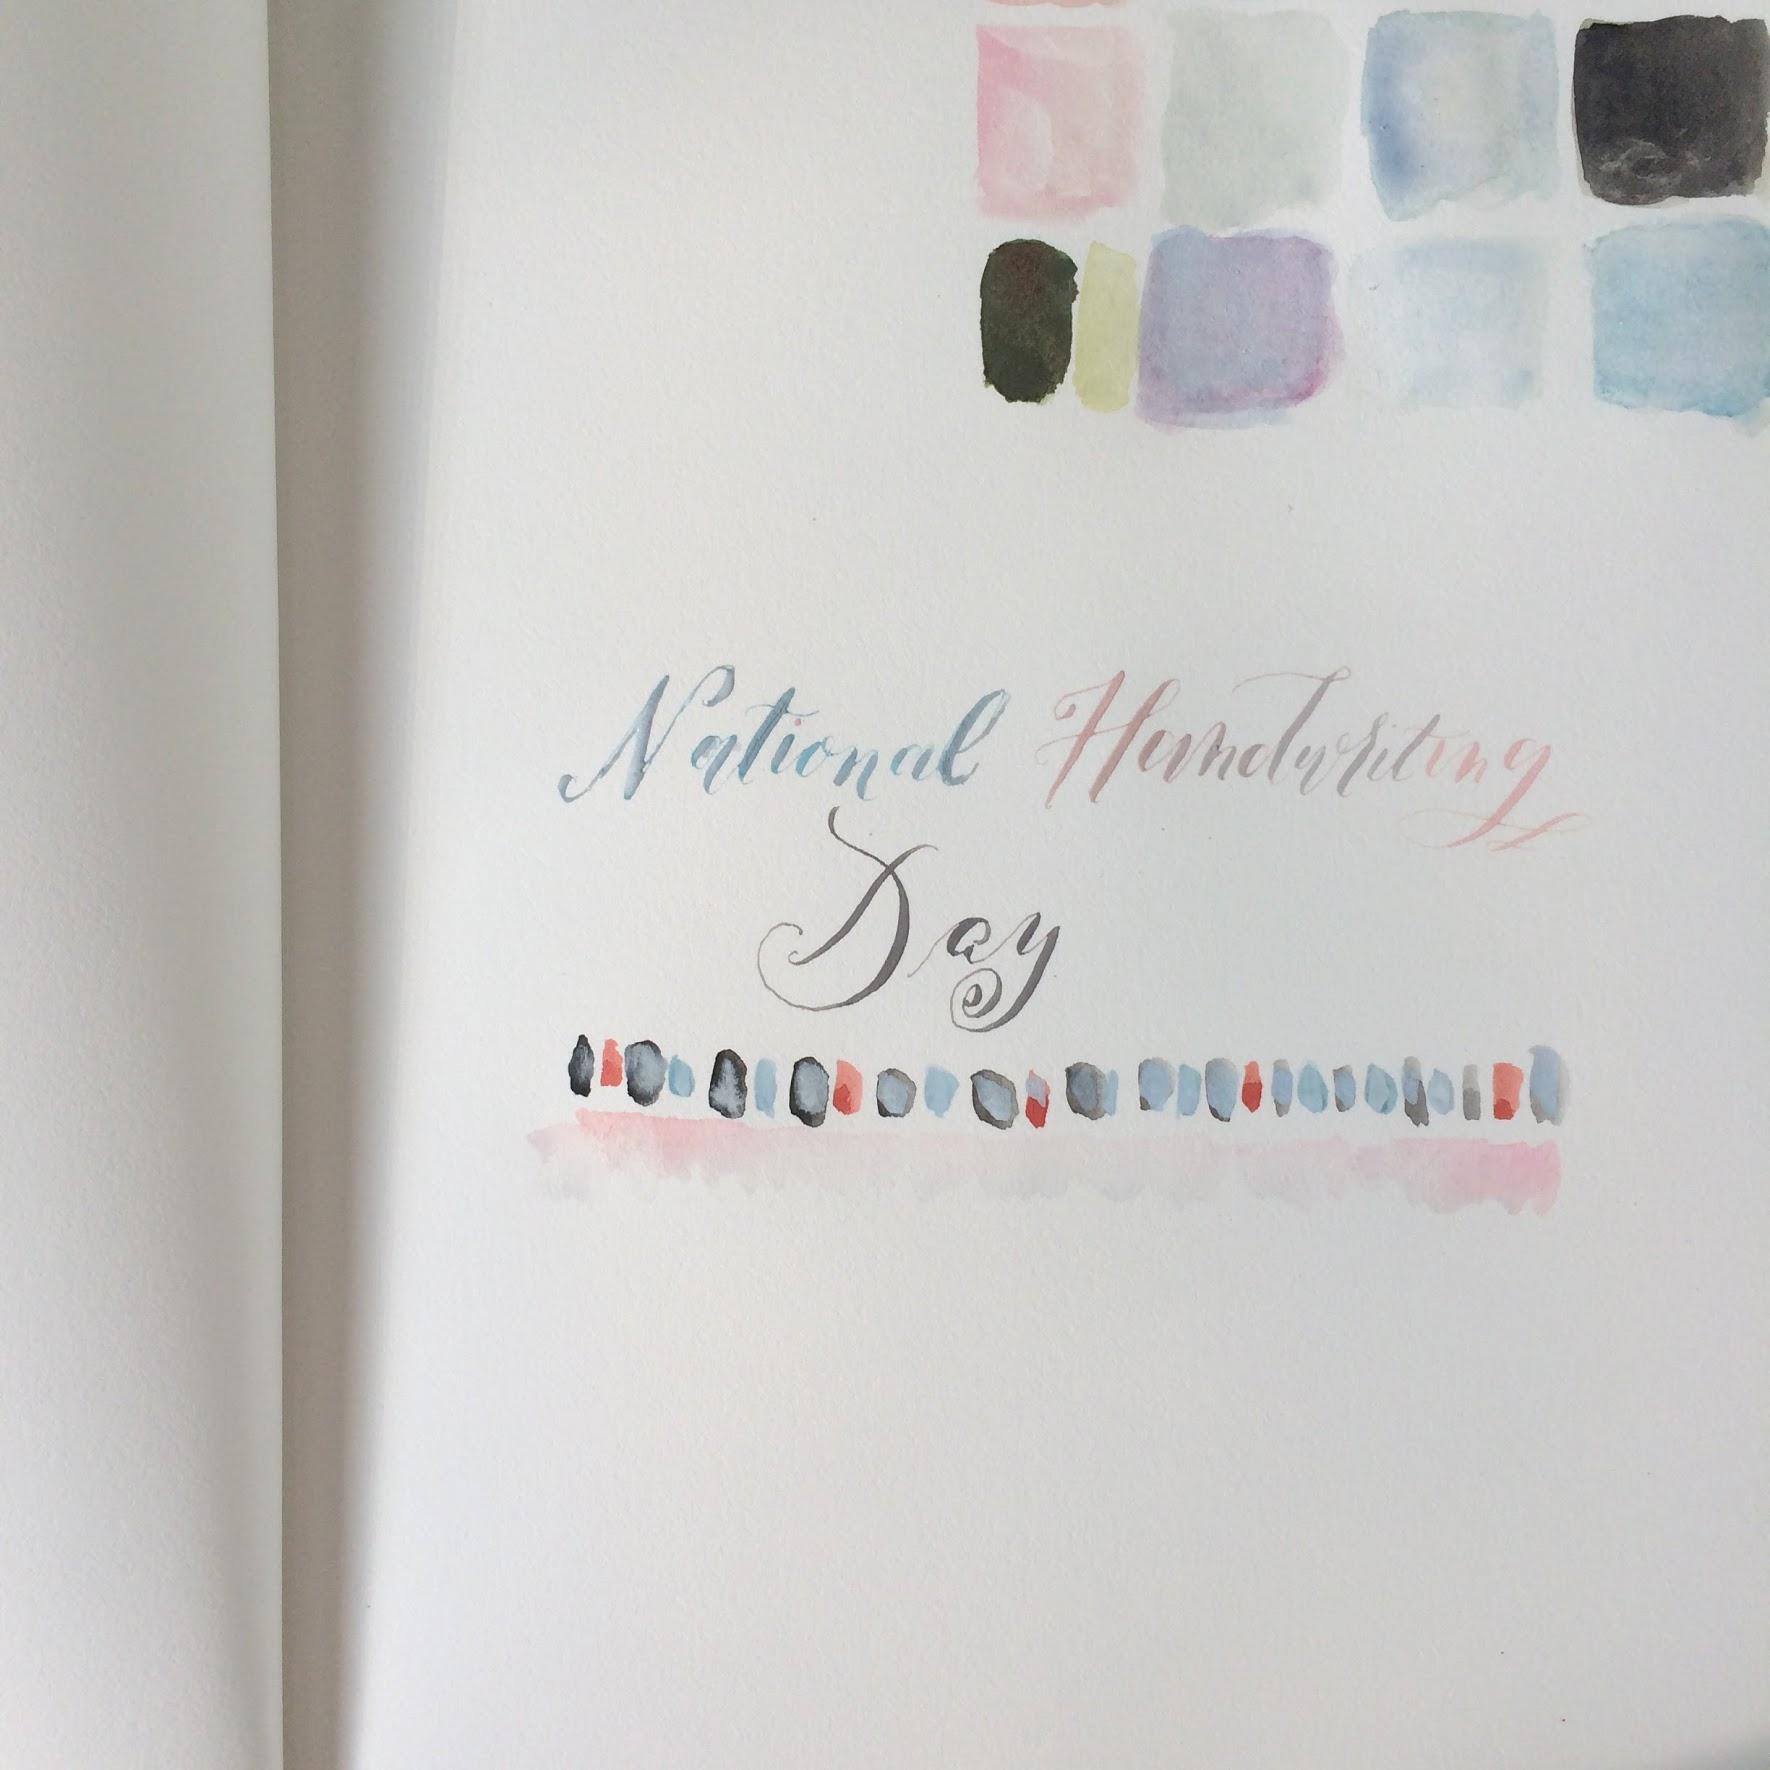 national handwriting day.jpg